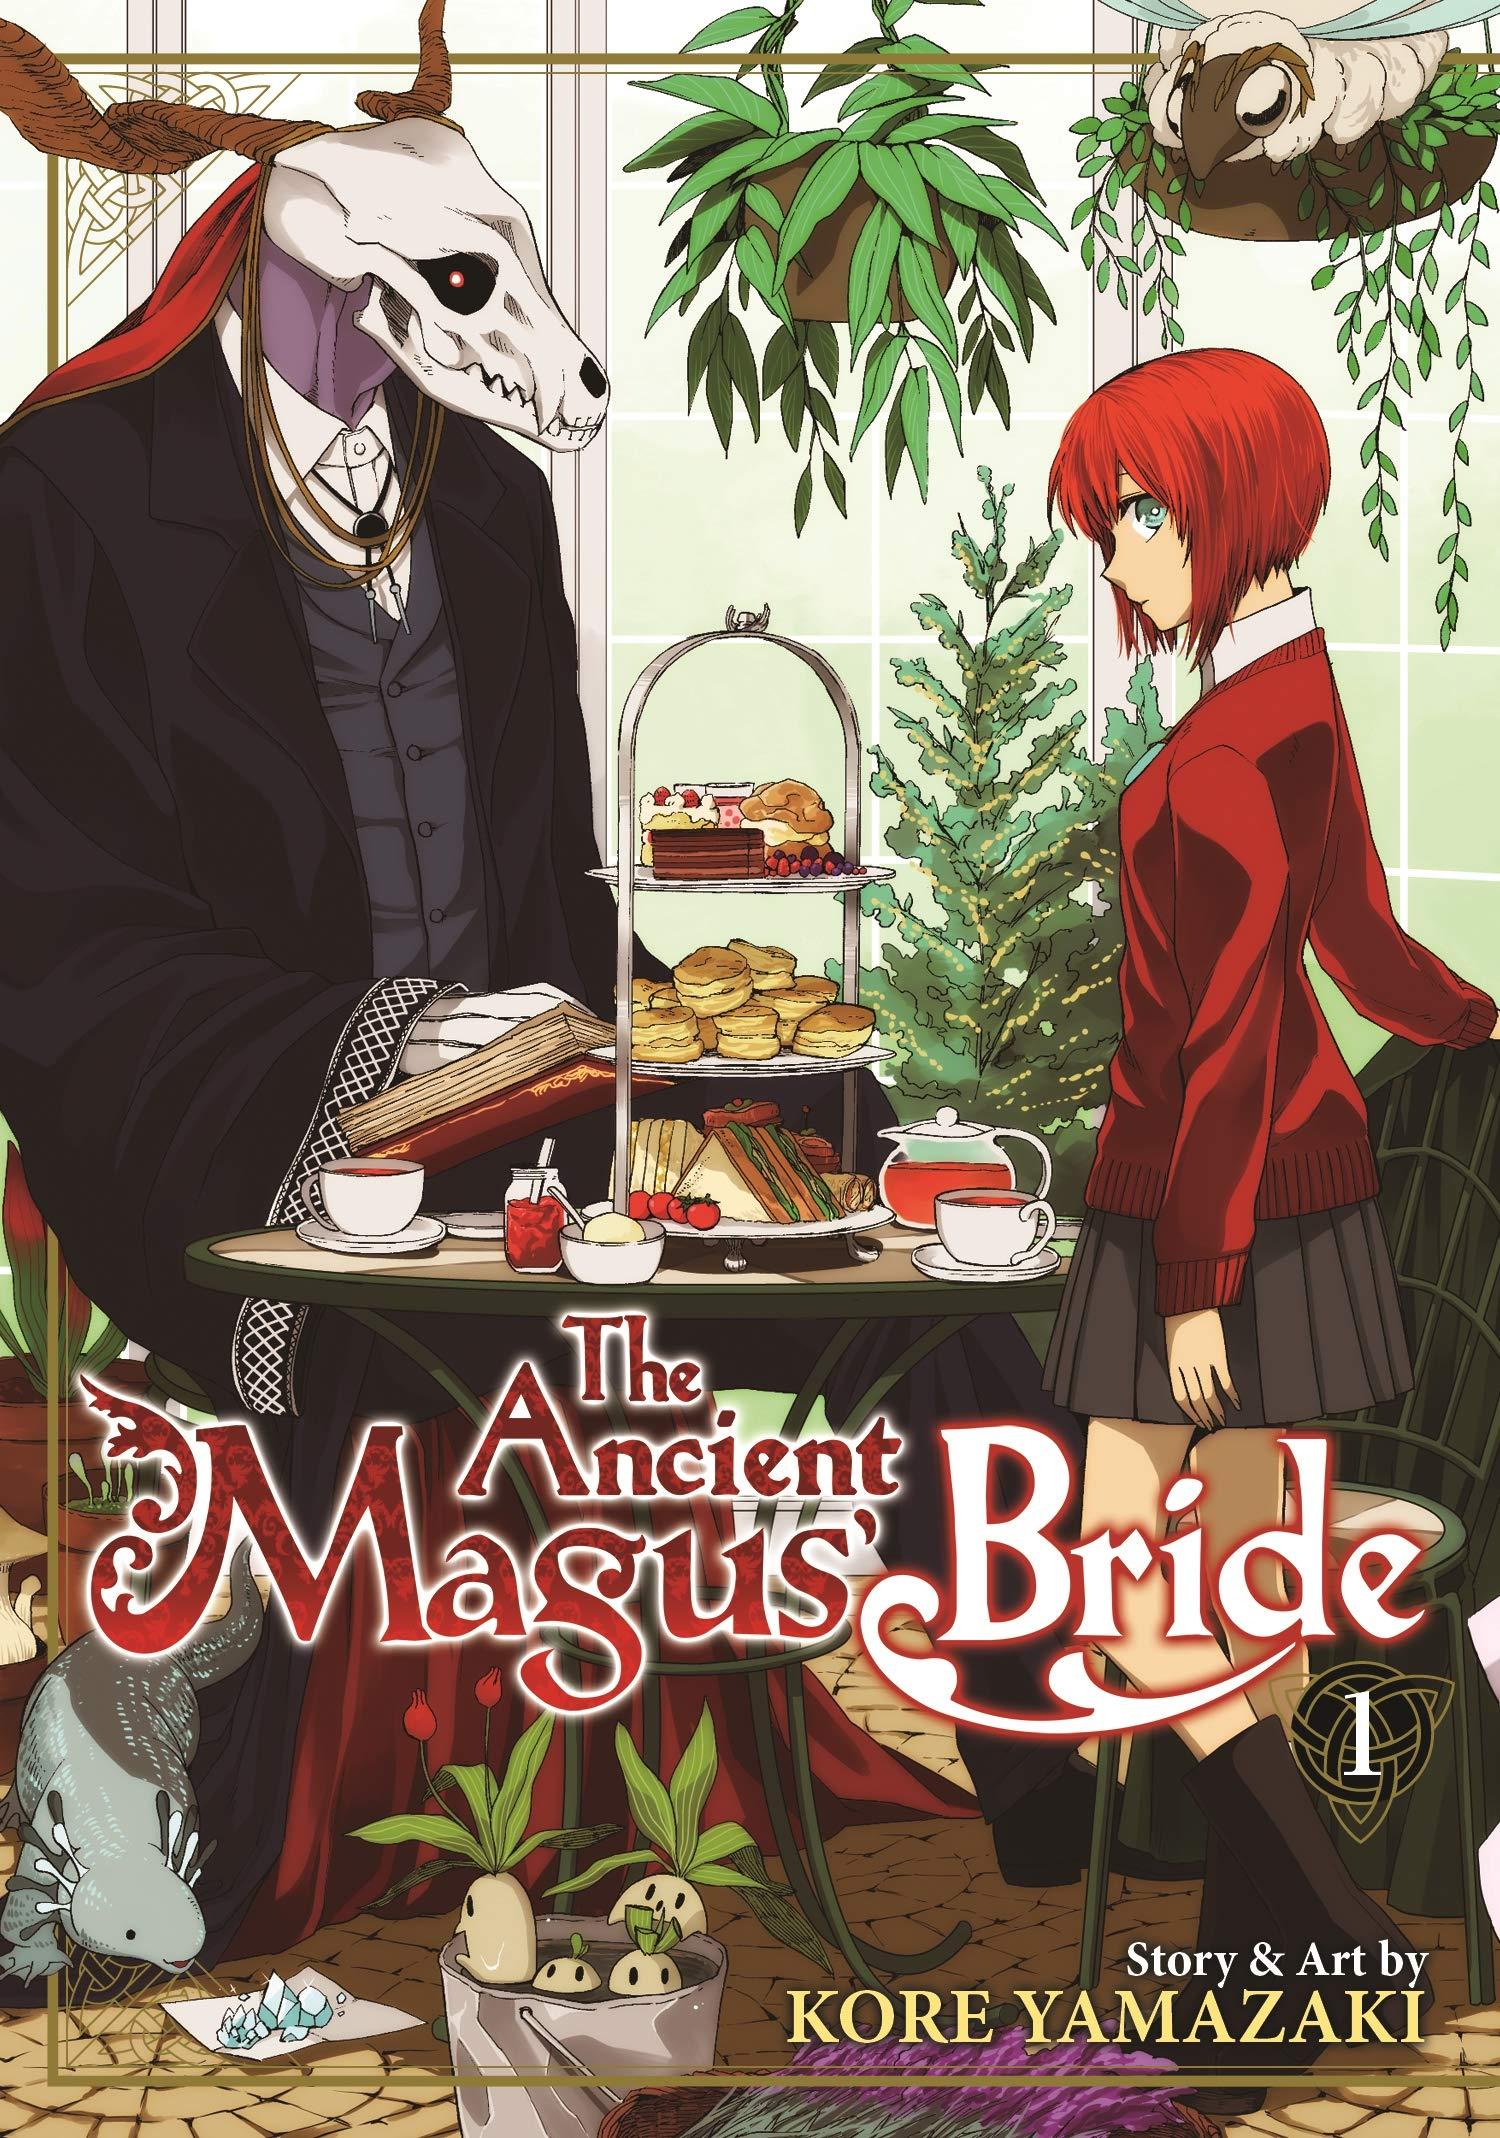 Amazon.com: The Ancient Magus' Bride Vol. 1 (The Ancient Magus' Bride, 1)  (9781626921870): Yamazaki, Kore: Books